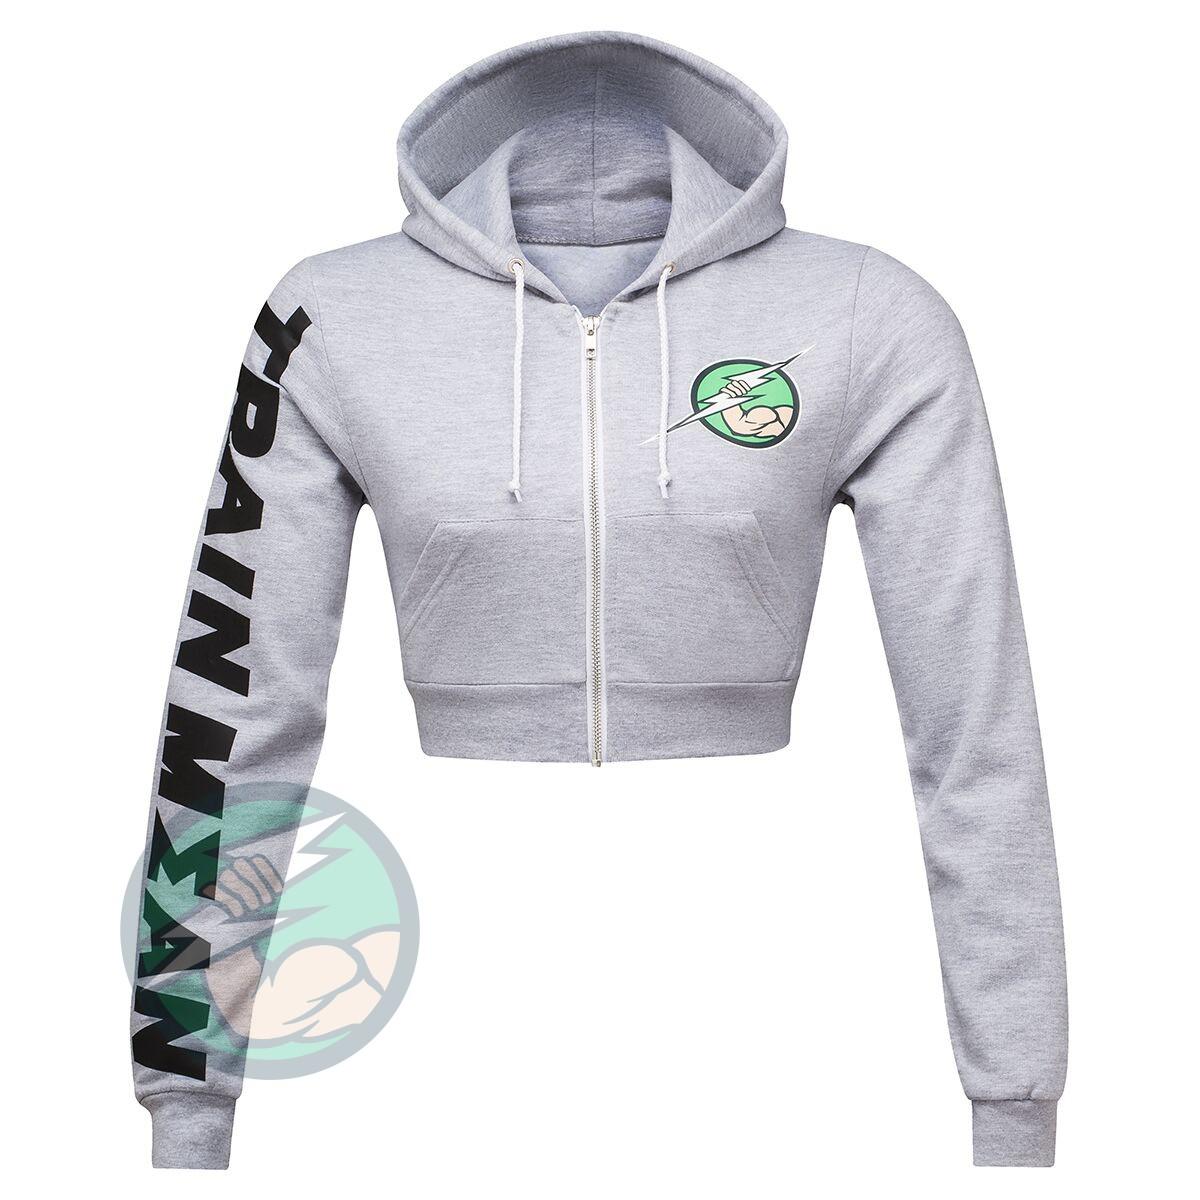 Jackets/Hoodies Womens Clothing